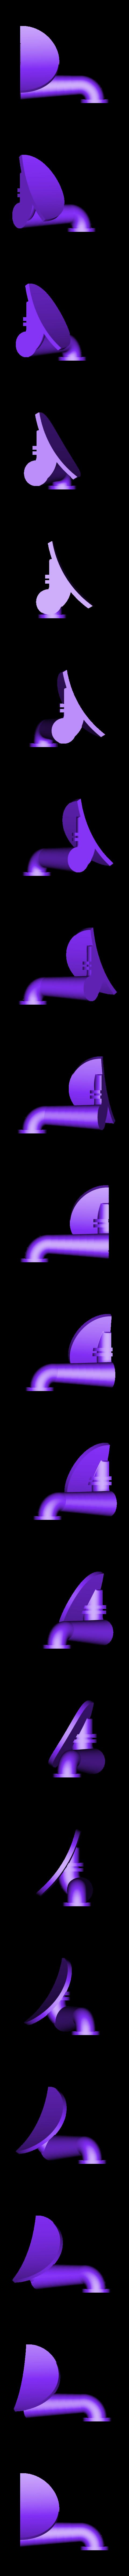 MirrorSteam_Pipe_Boiler-b.STL Download free STL file 4-8-8-4 Big Boy Locomotive • 3D printer object, RaymondDeLuca